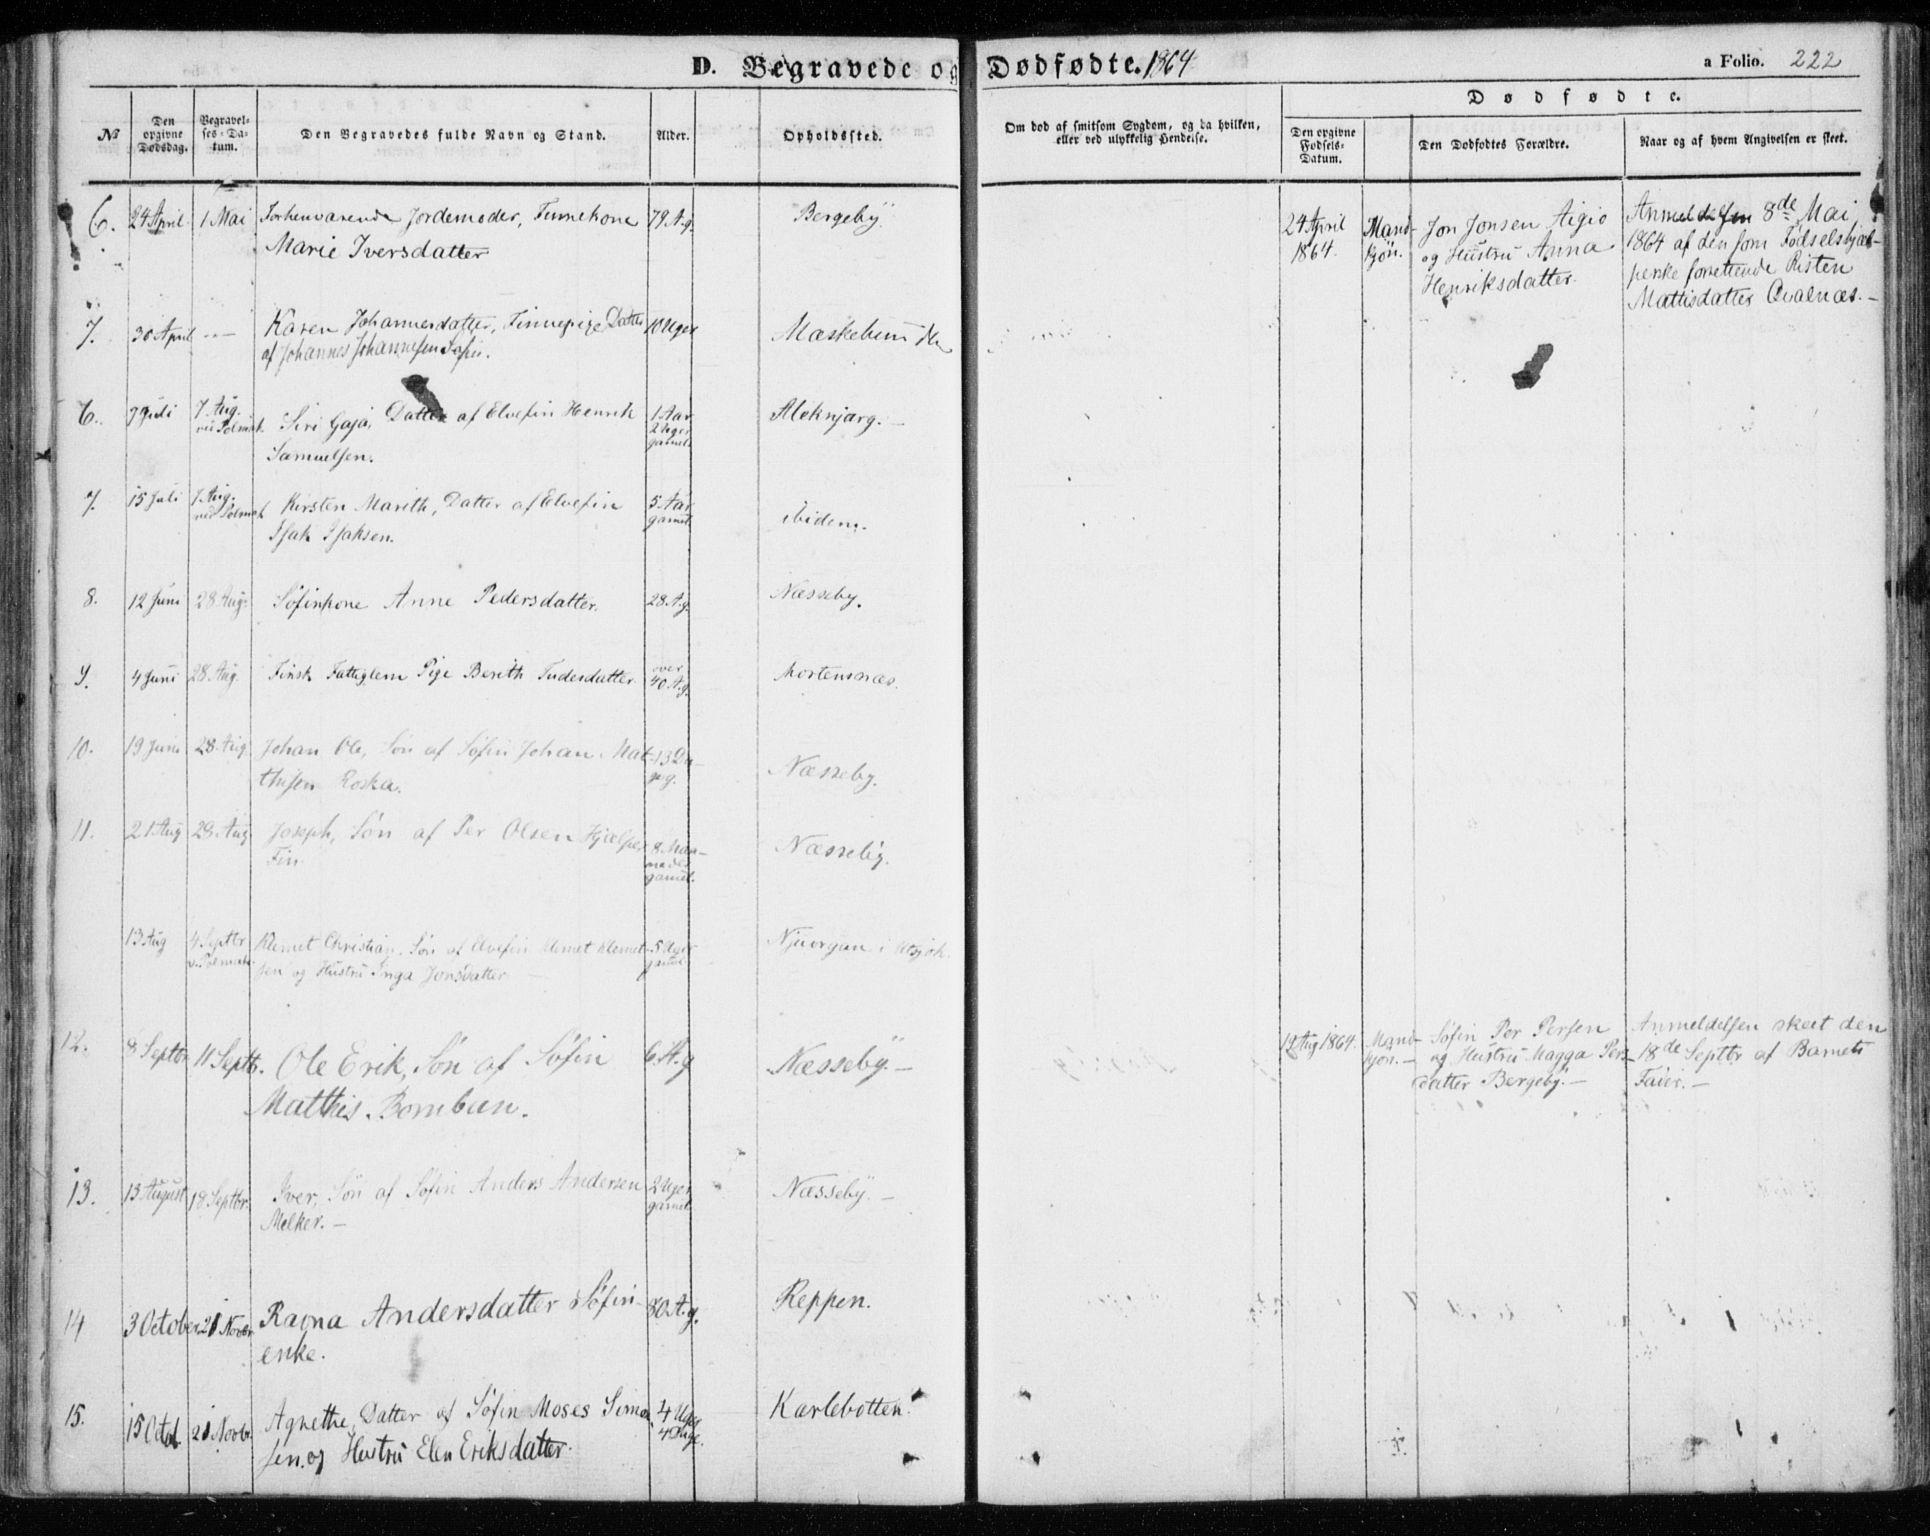 SATØ, Nesseby sokneprestkontor, H/Ha/L0002kirke: Ministerialbok nr. 2, 1856-1864, s. 222